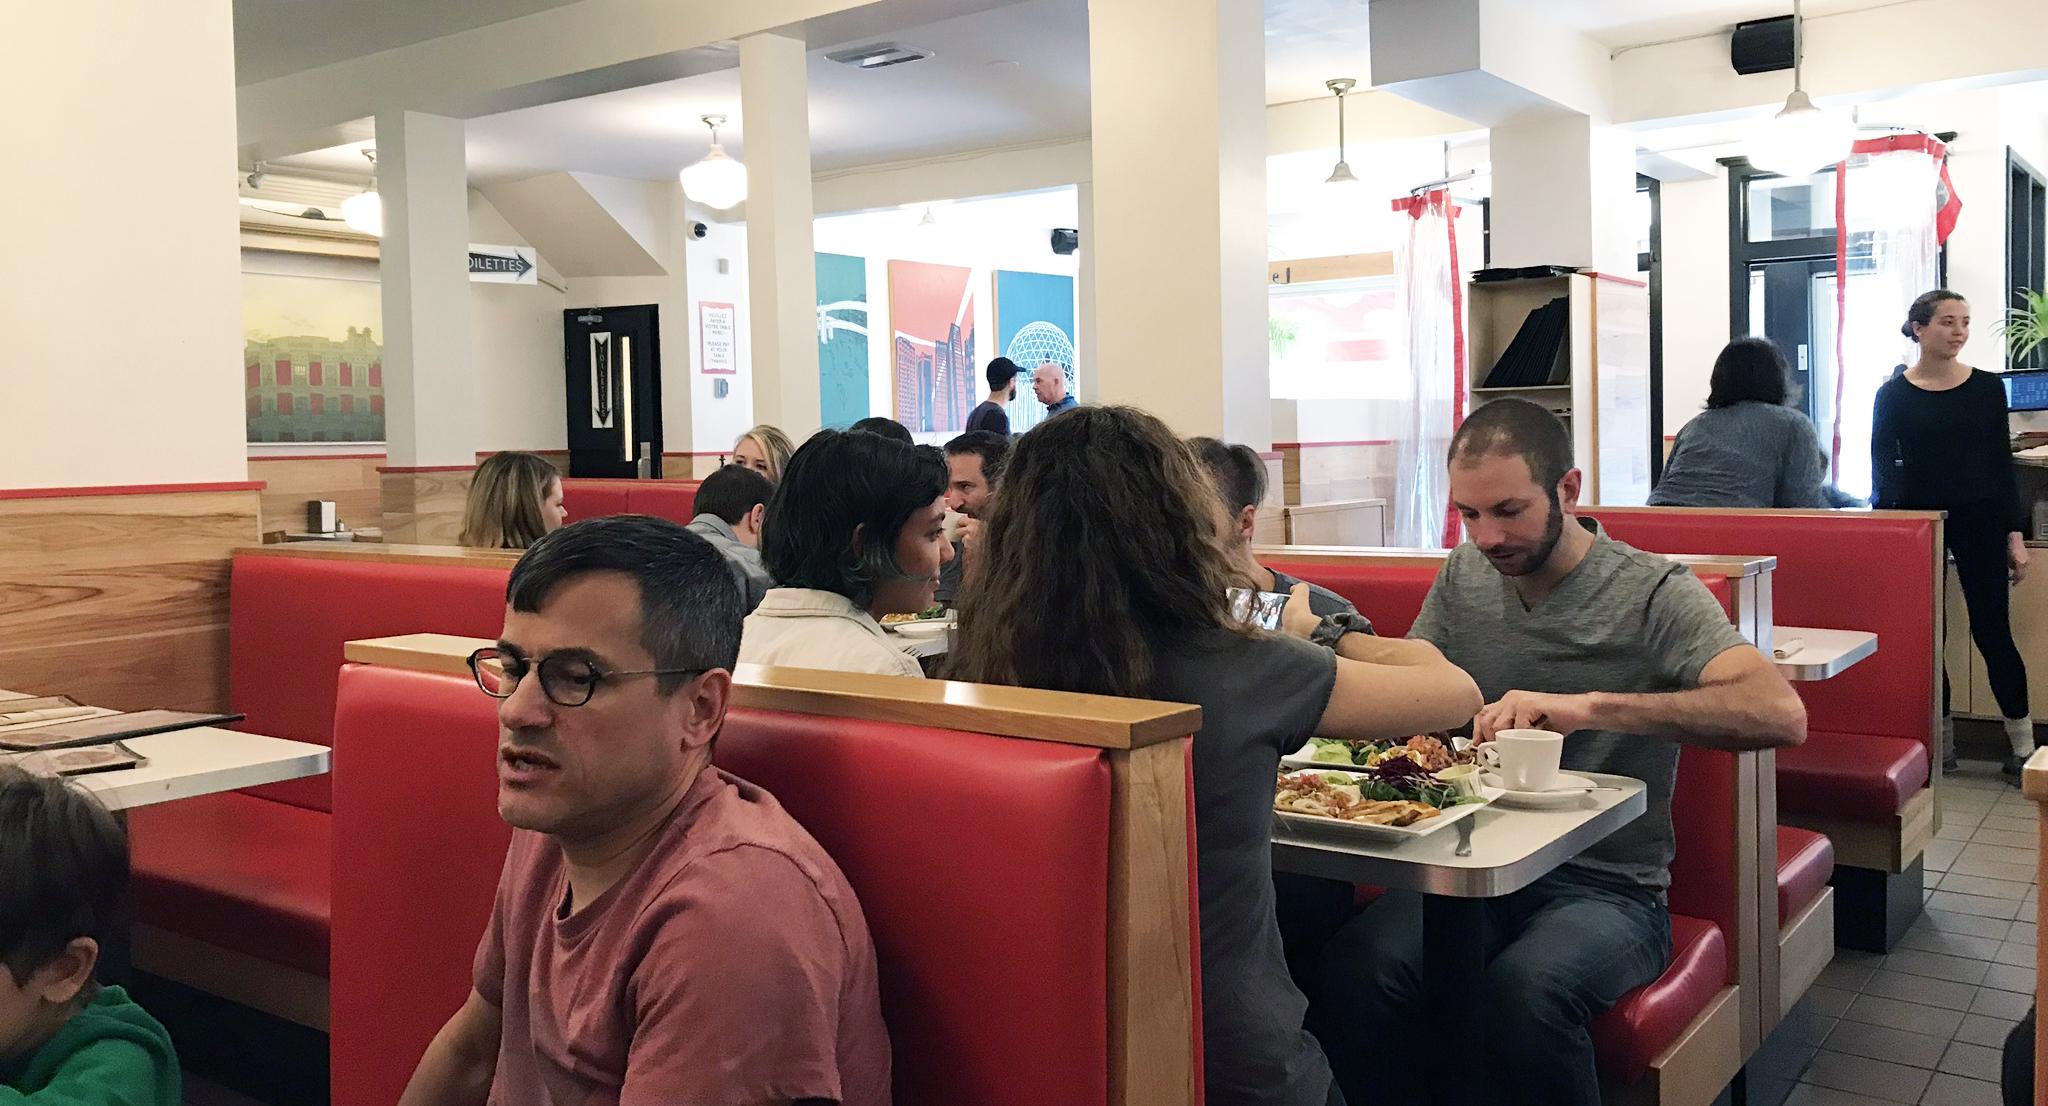 Aux Vivres - Interior Restaurant, Vibe